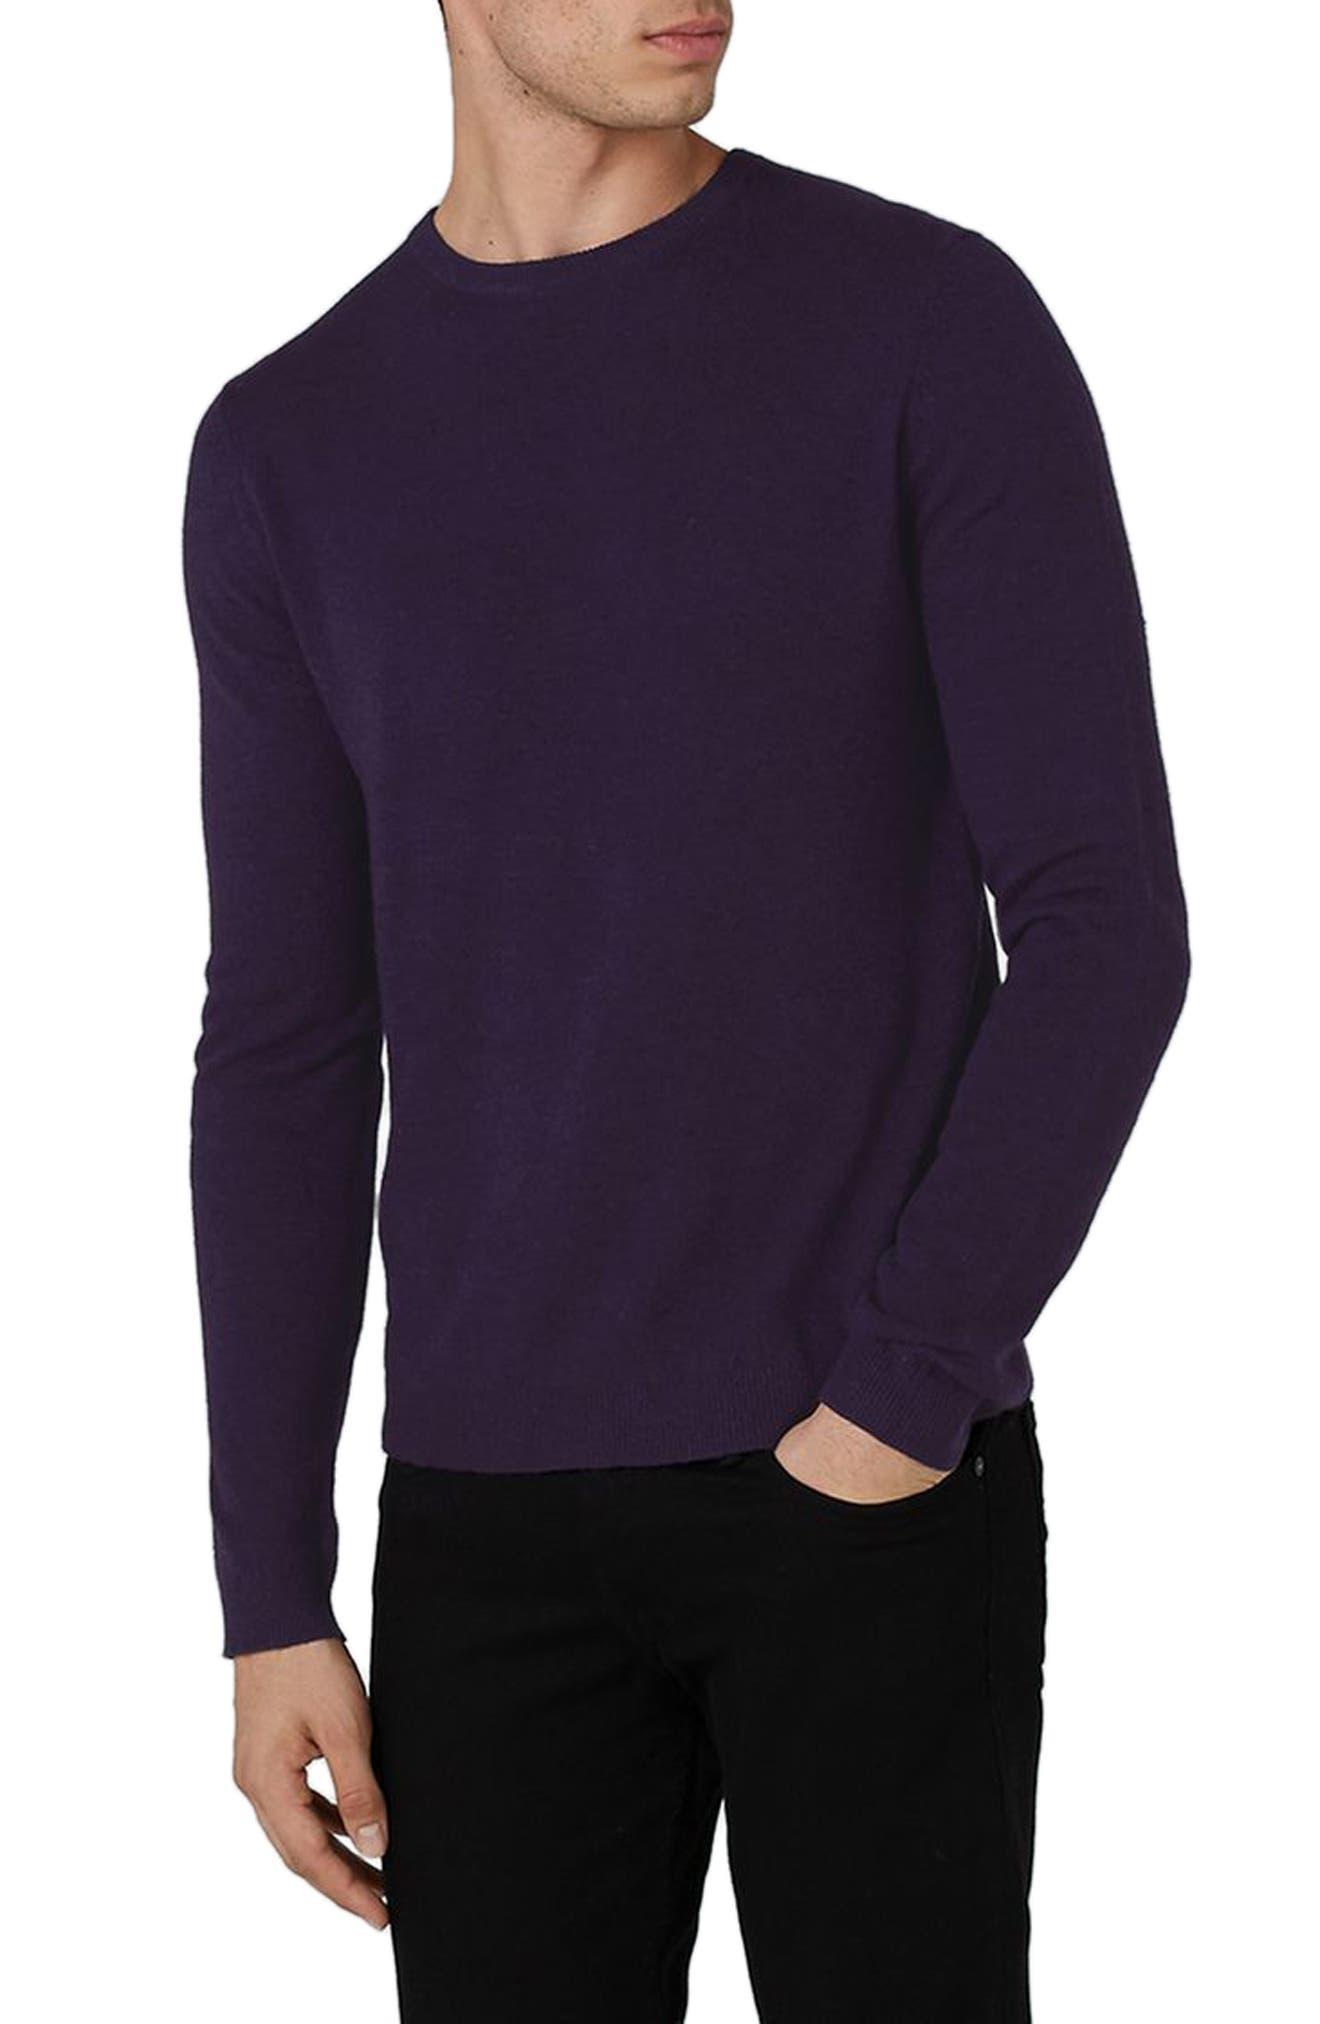 Men's Slim Fit Sweaters   Nordstrom